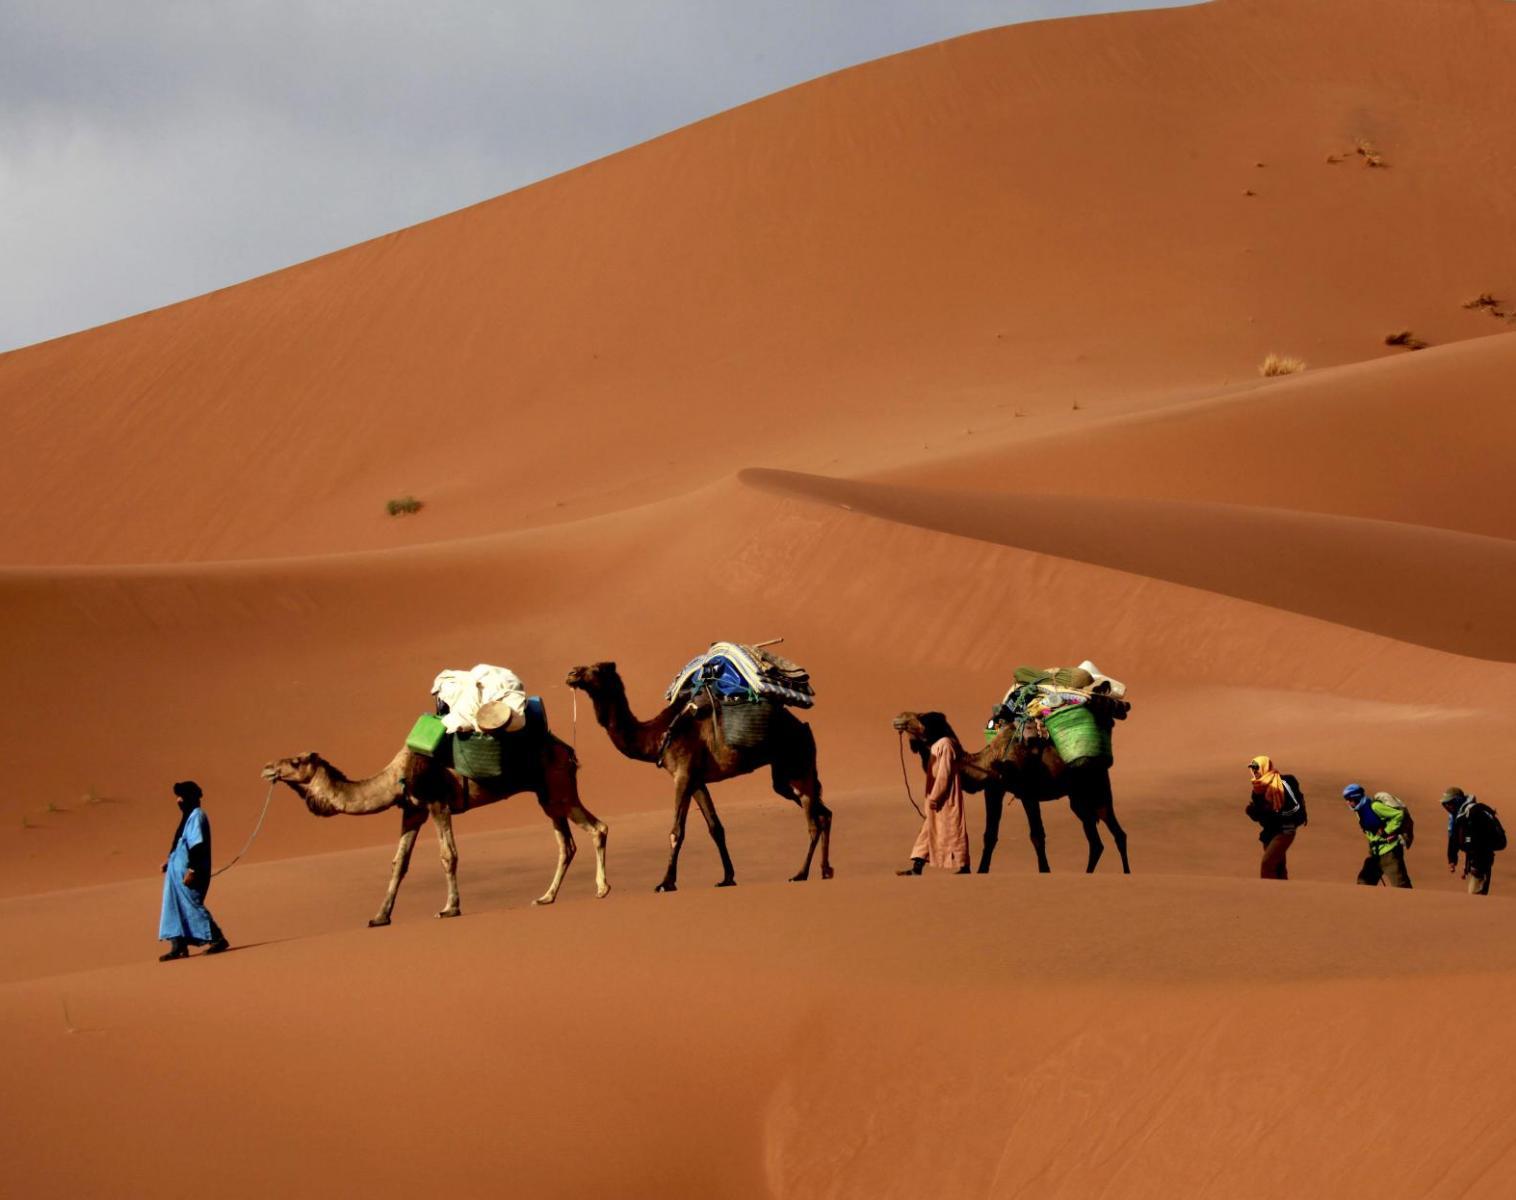 Maroc  Trek du Drâa aux dunes chantantes   Trek & Randonnée